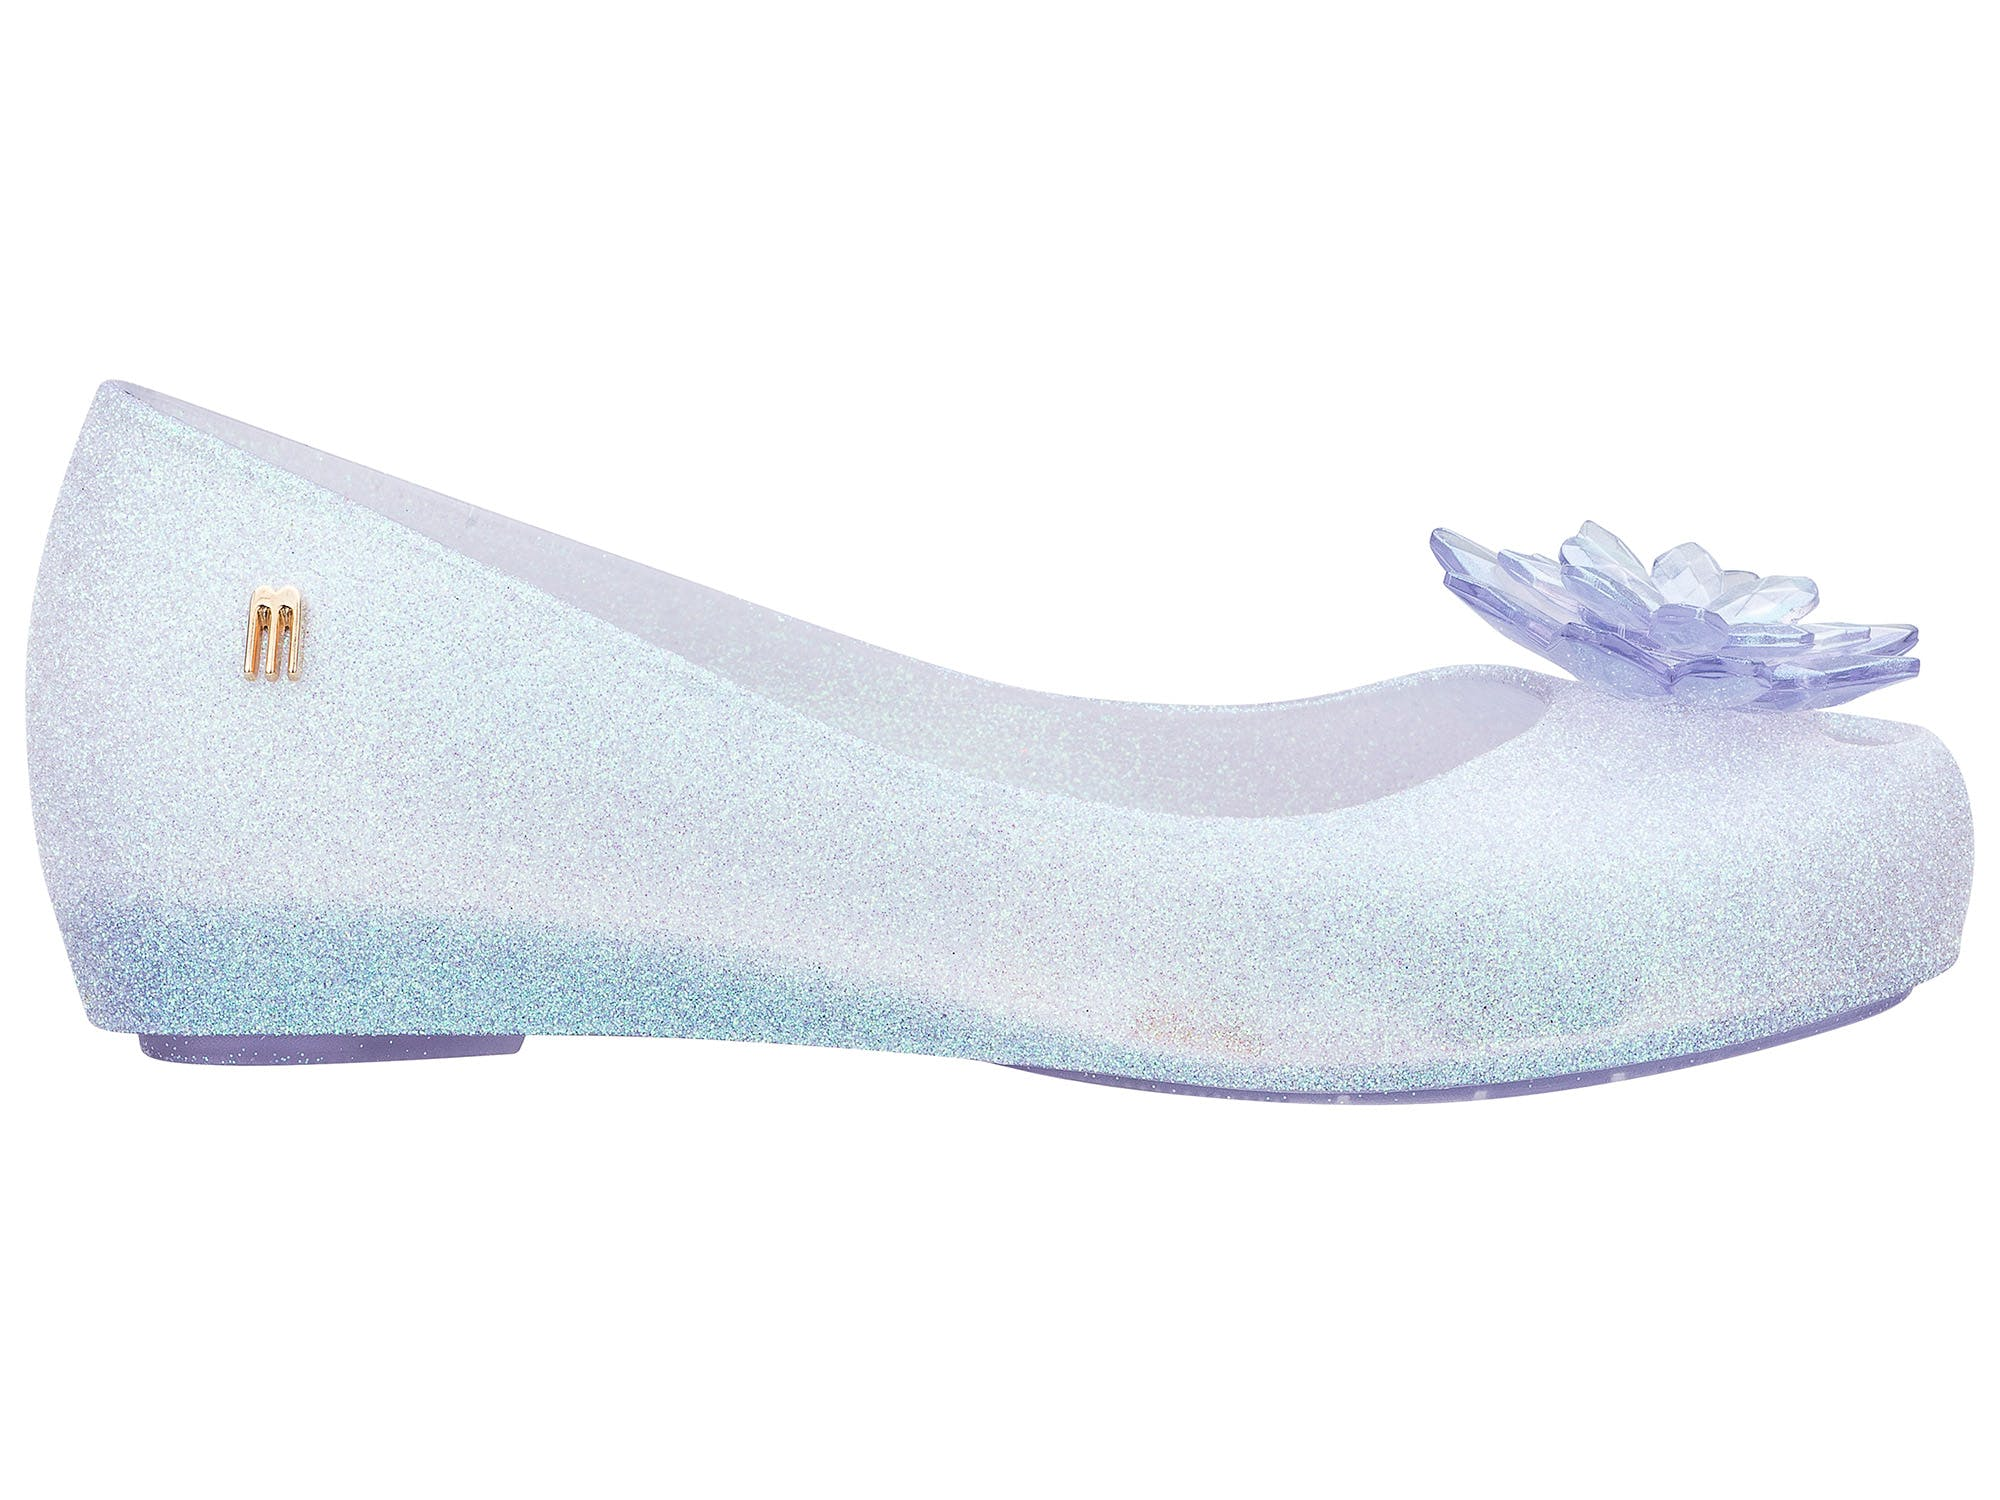 Melissa Mel Ultragirl Frozen Vidro Glitter